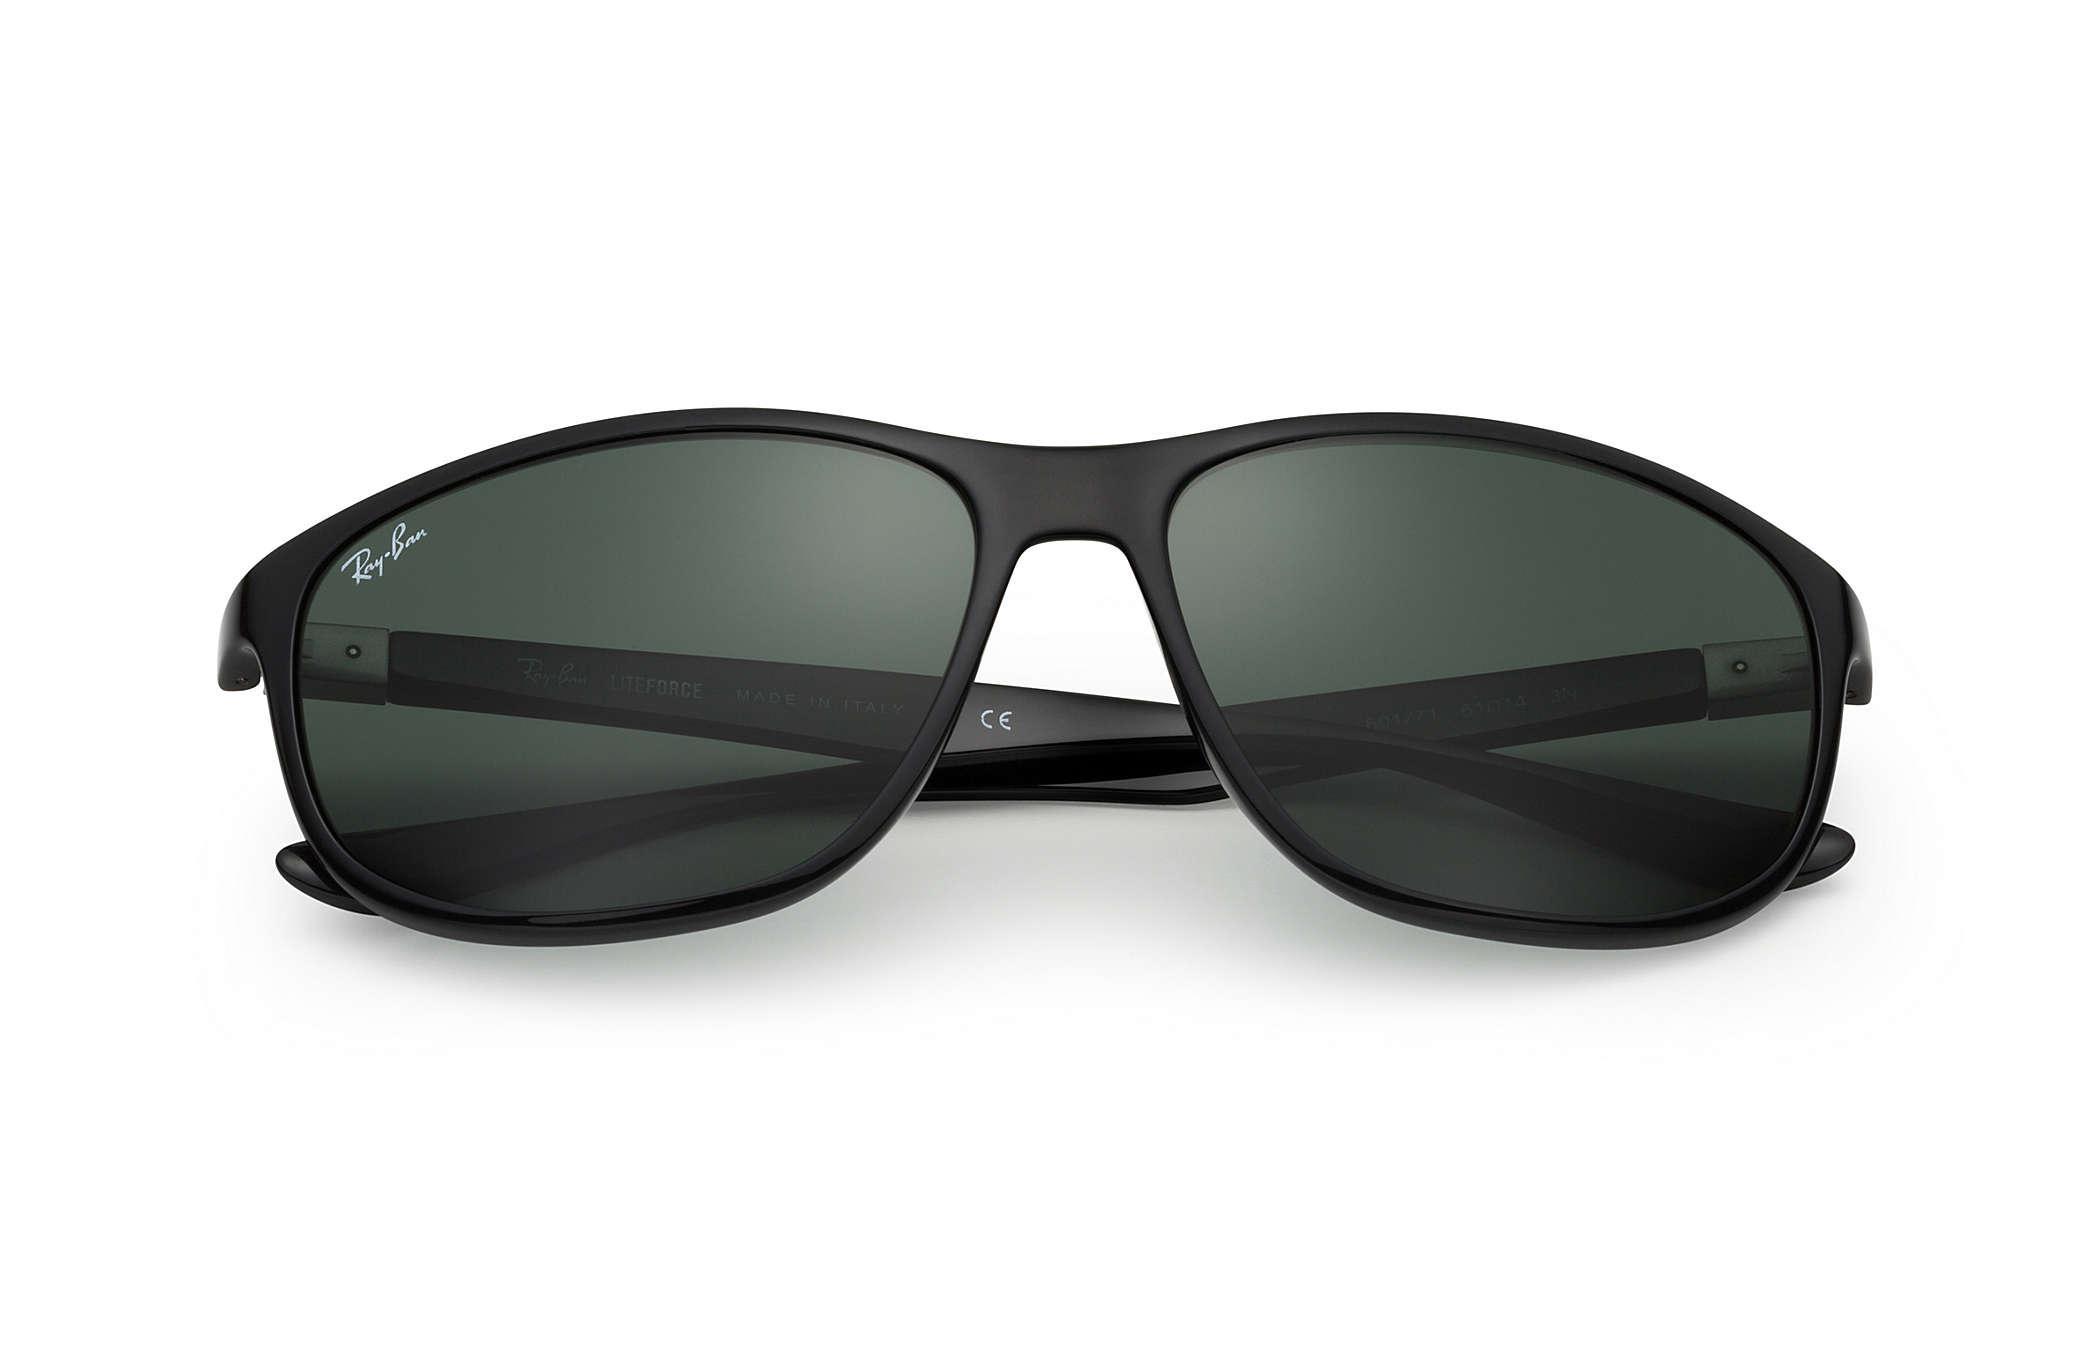 78407decb11 Ray-Ban - Black Rb4213 for Men - Lyst. View fullscreen